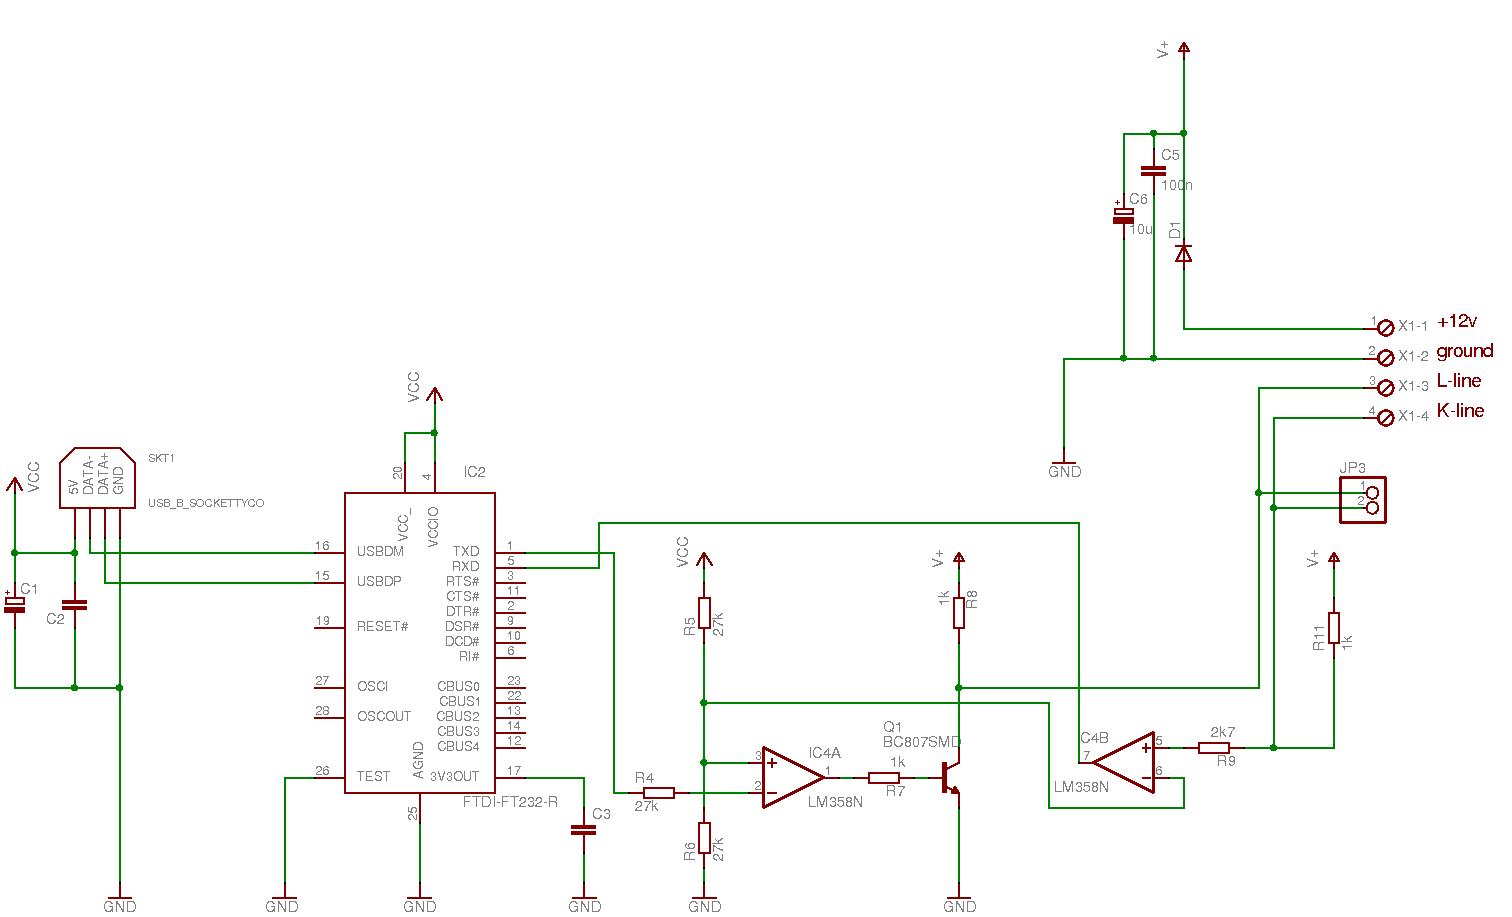 Fiat Coupe 20v Wiring Diagram Data Diagrams Engine Automotive Rh Mazhai Net 124 Spider Body